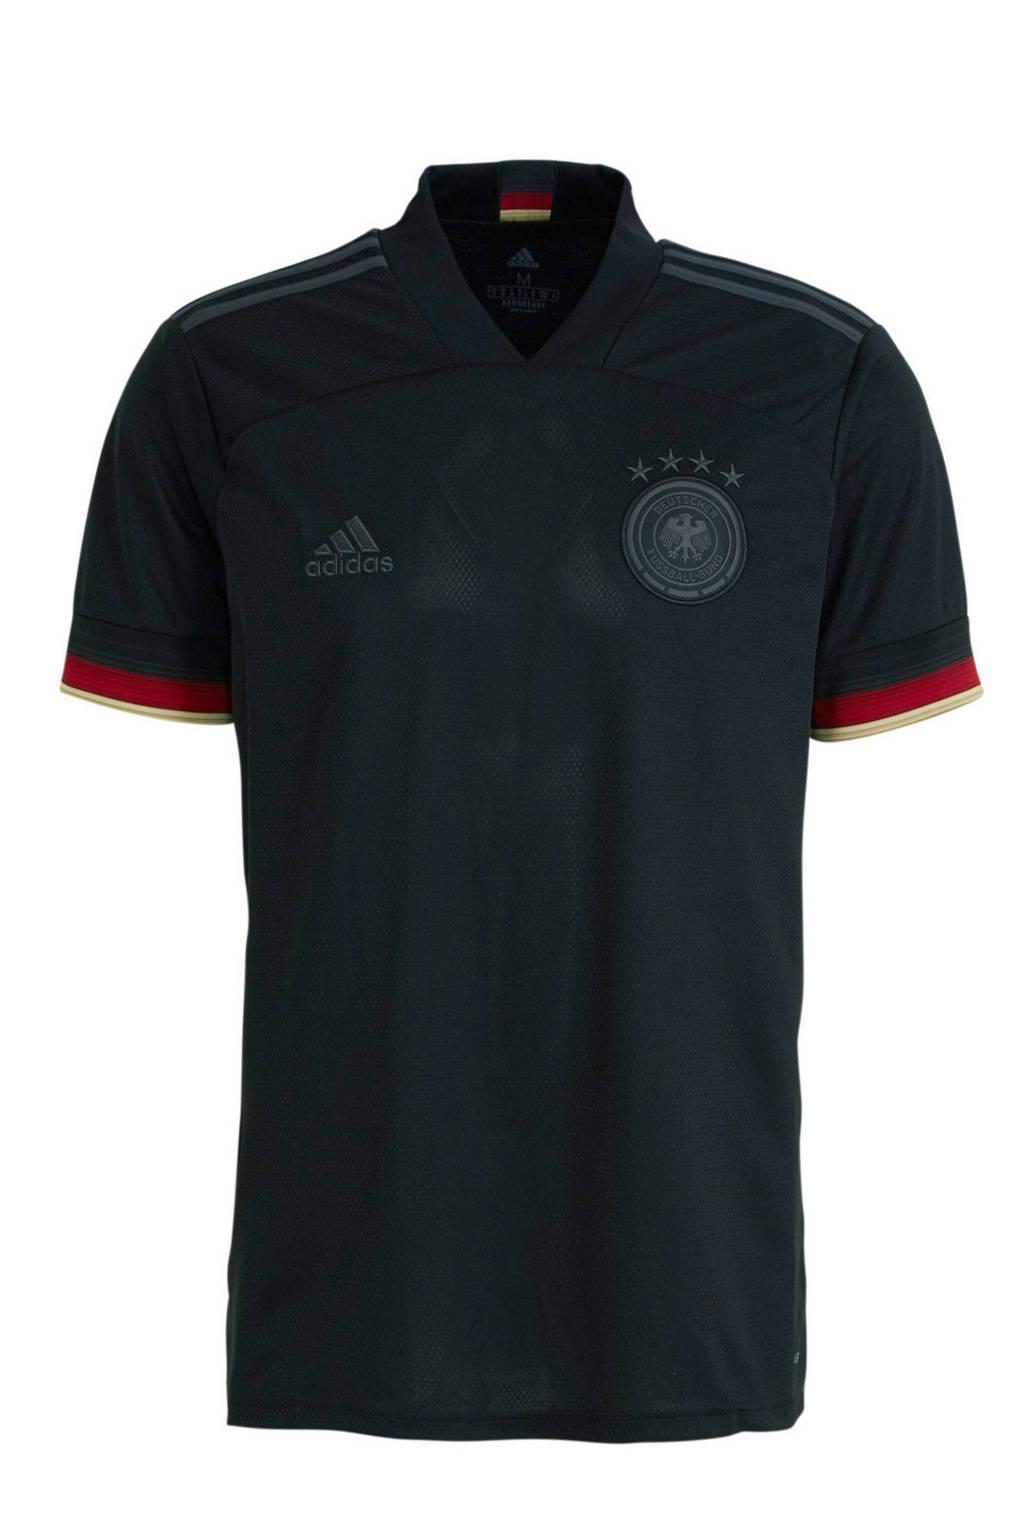 adidas Performance  Duitsland voetbalshirt uit zwart/antraciet, Zwart/antraciet